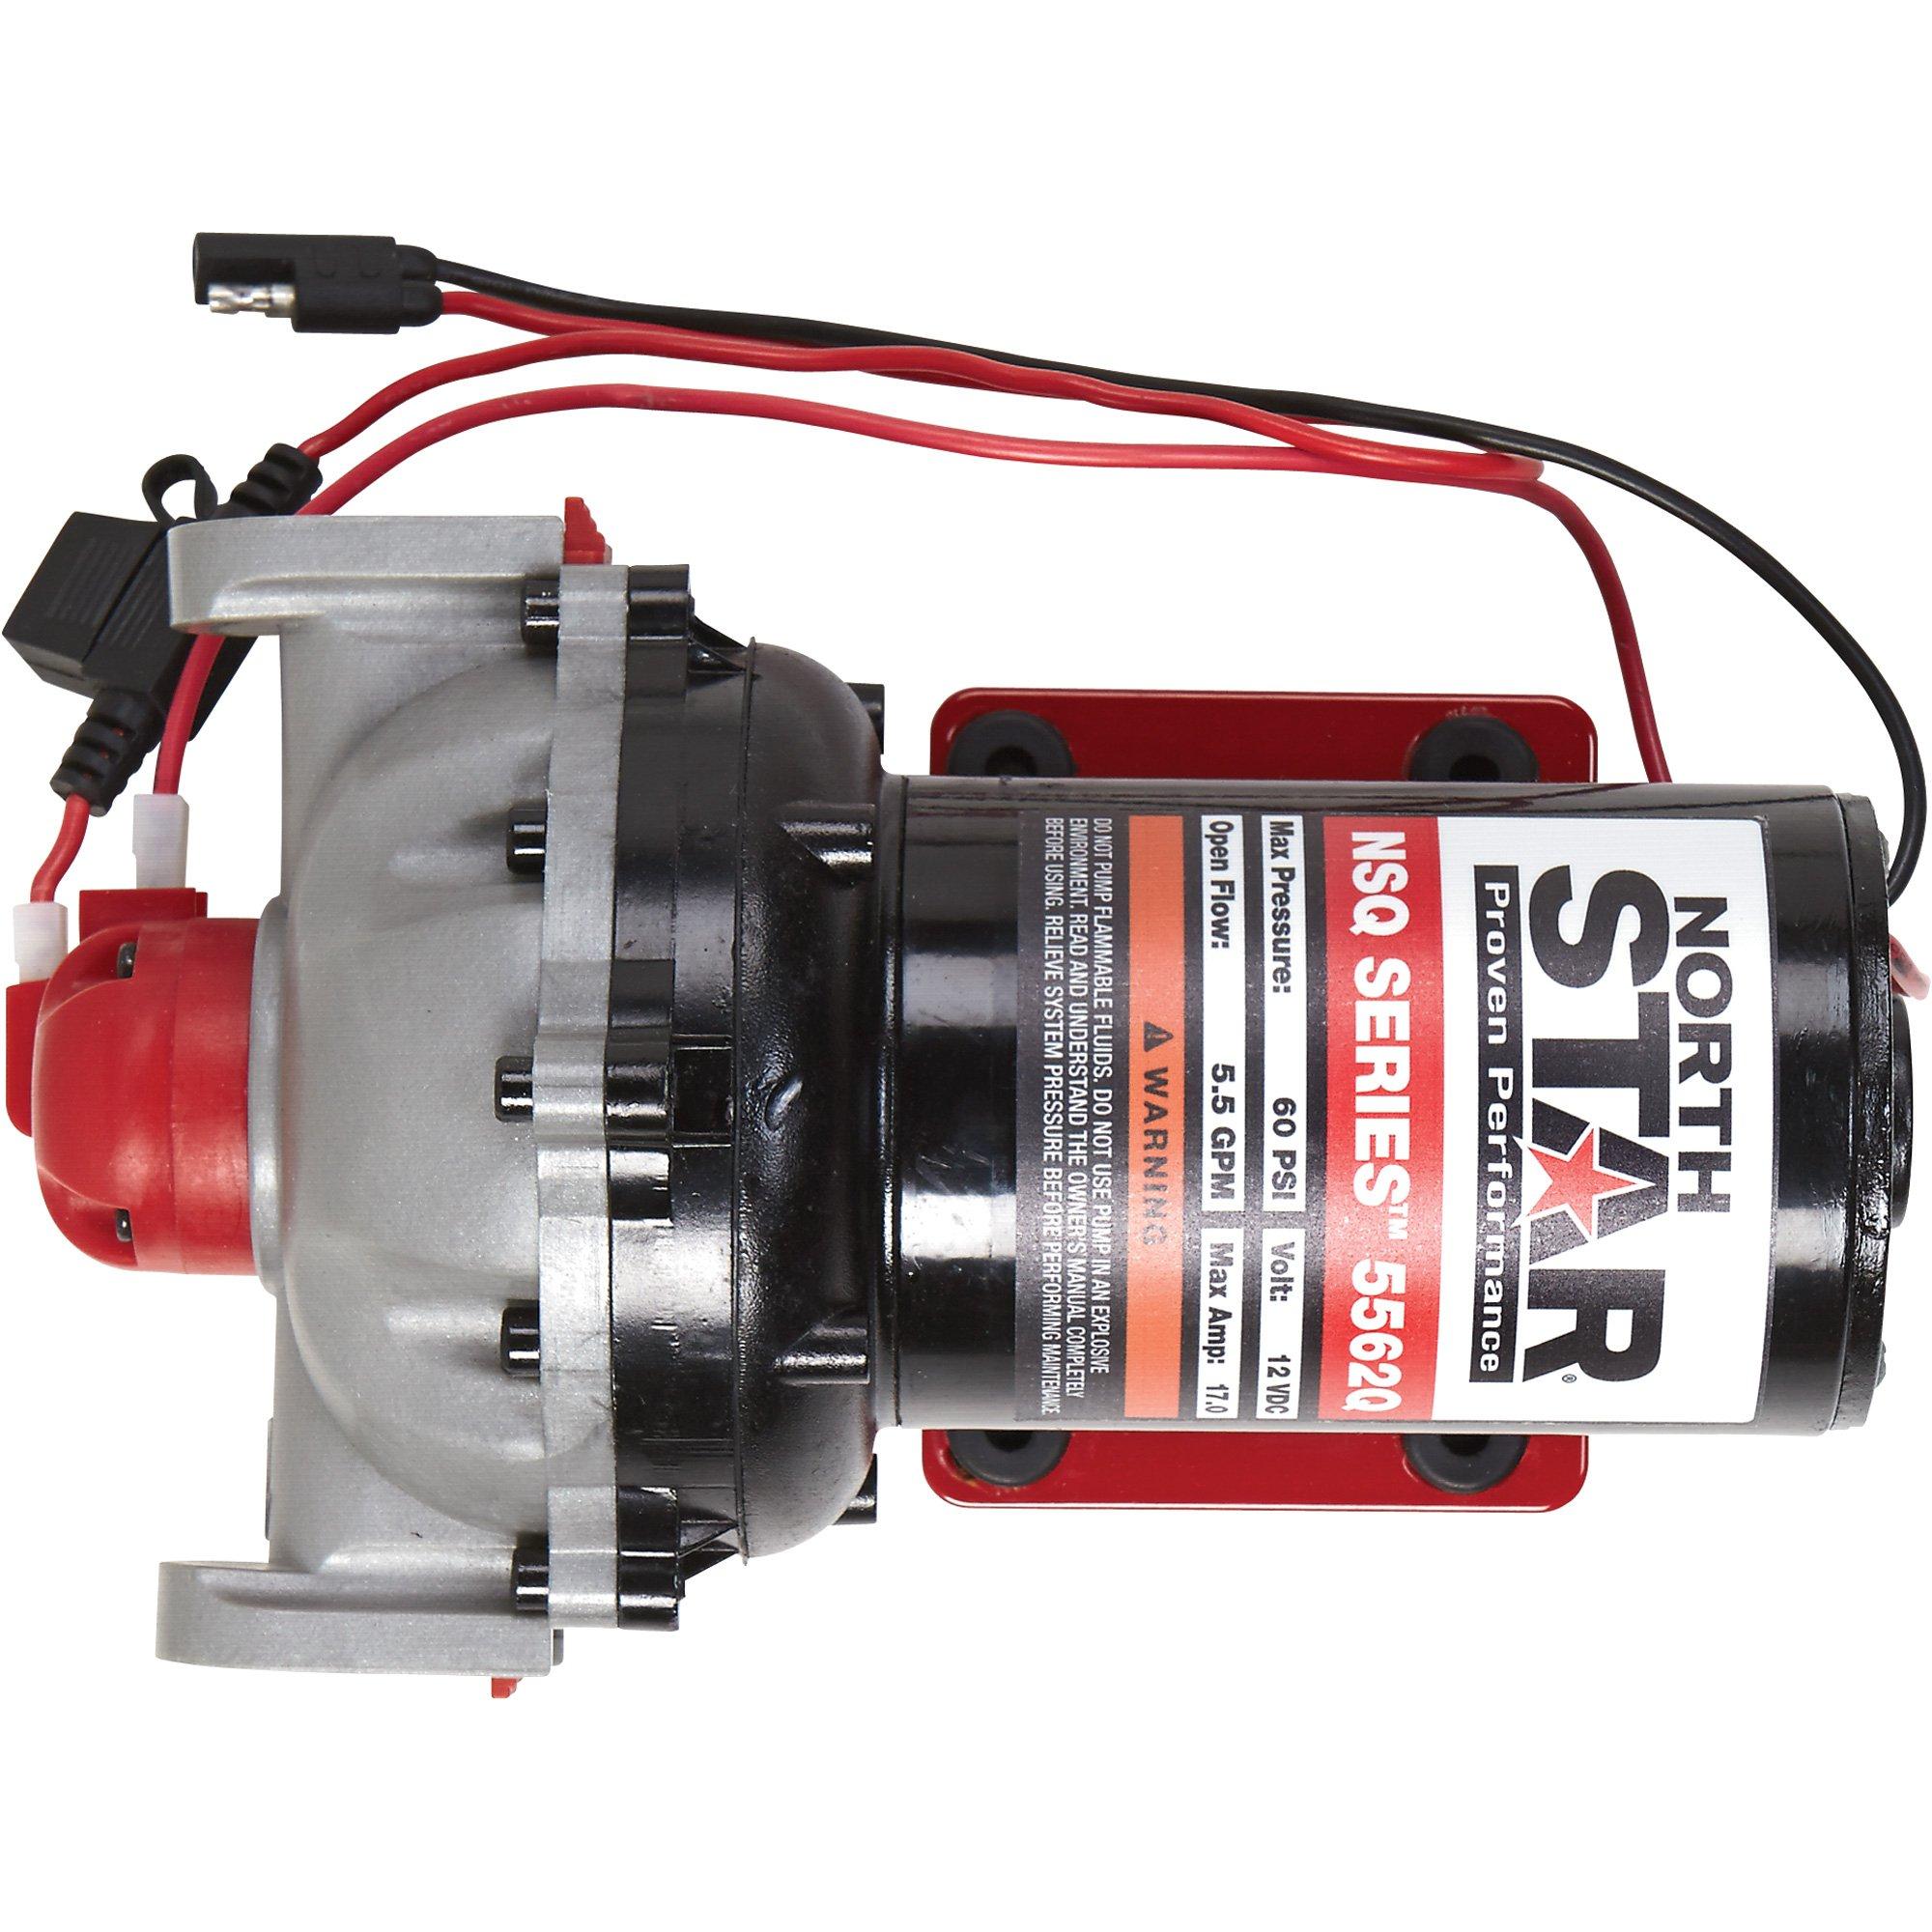 NorthStar NSQ Series 12V On-Demand Sprayer Diaphragm Pump - 5.5 GPM @ 60 PSI